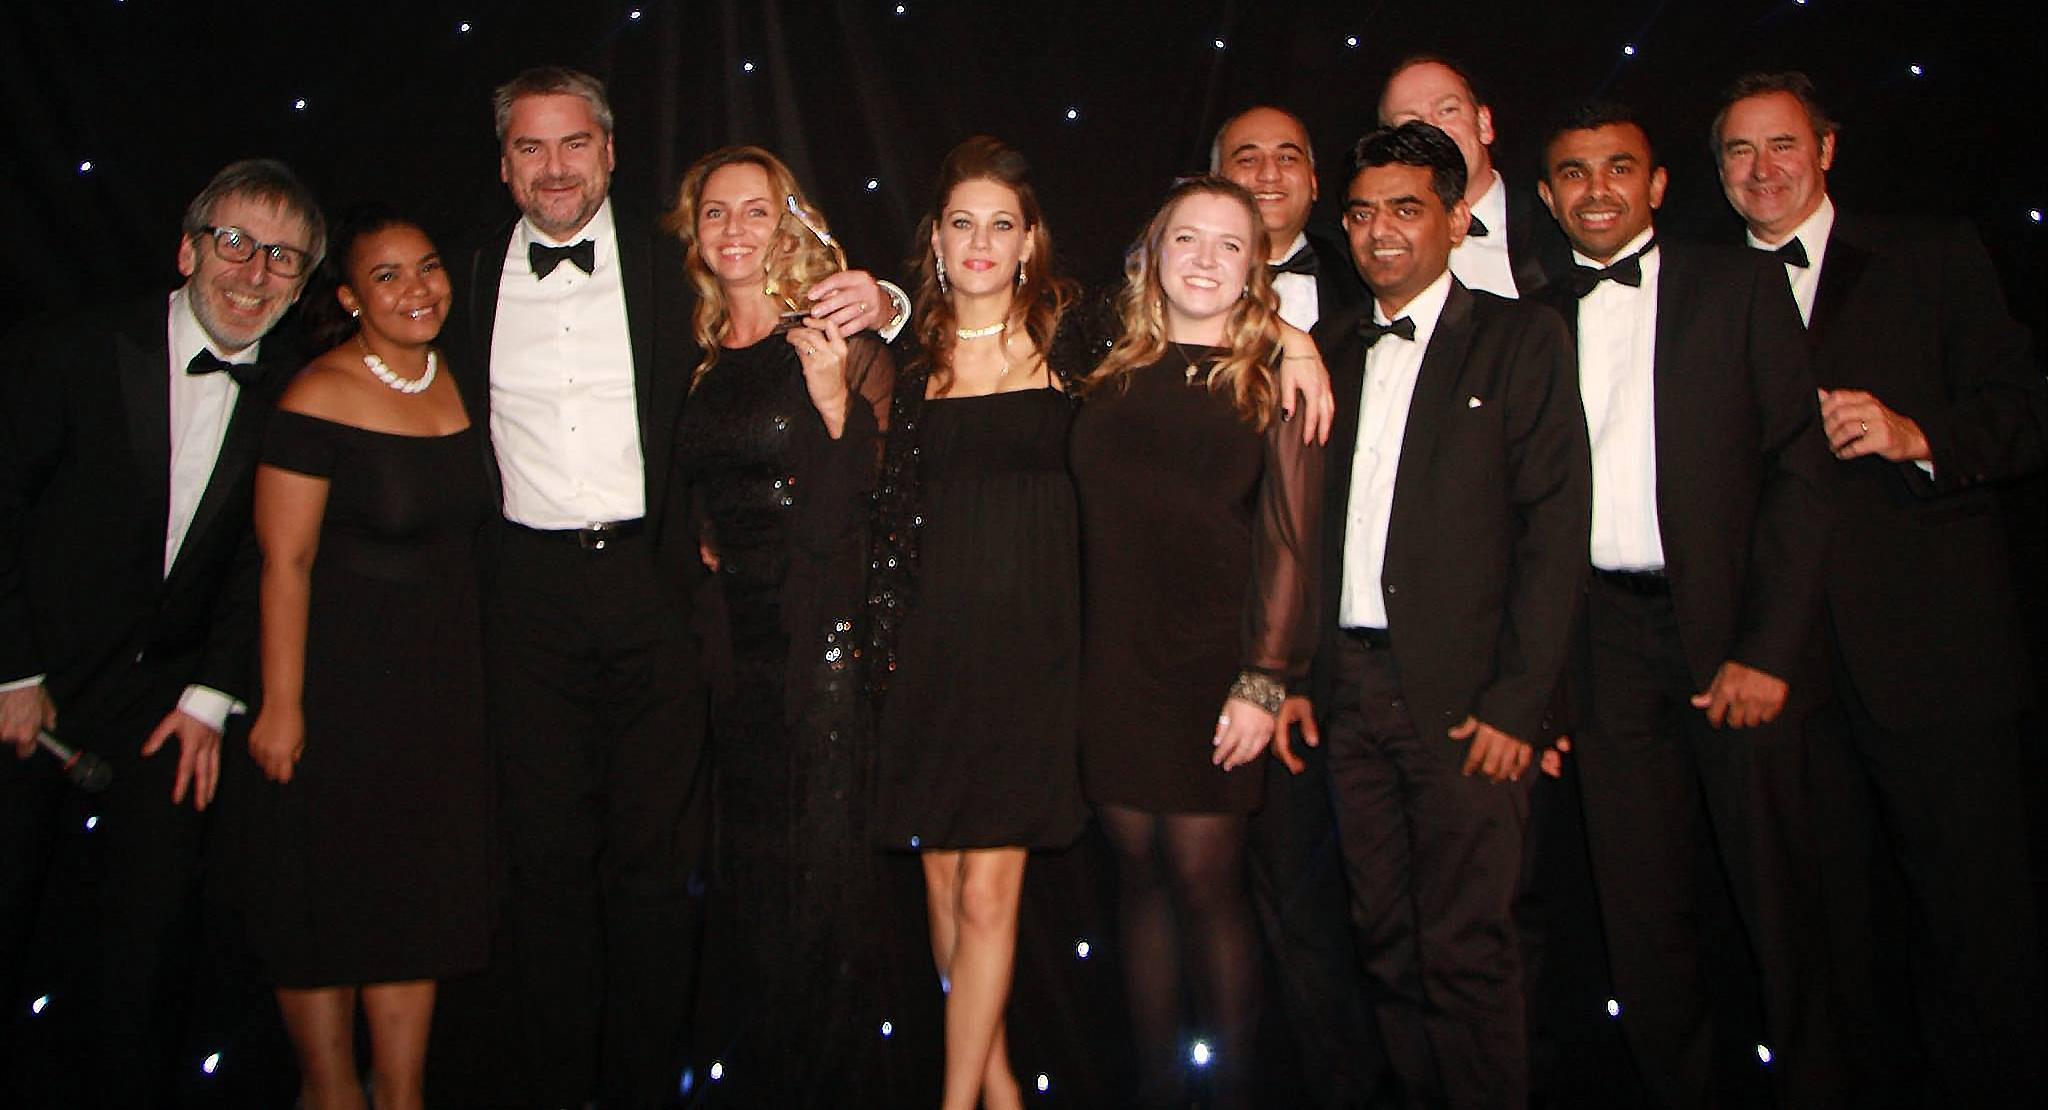 Adoddle wins at the Construction Computing Awards 2017